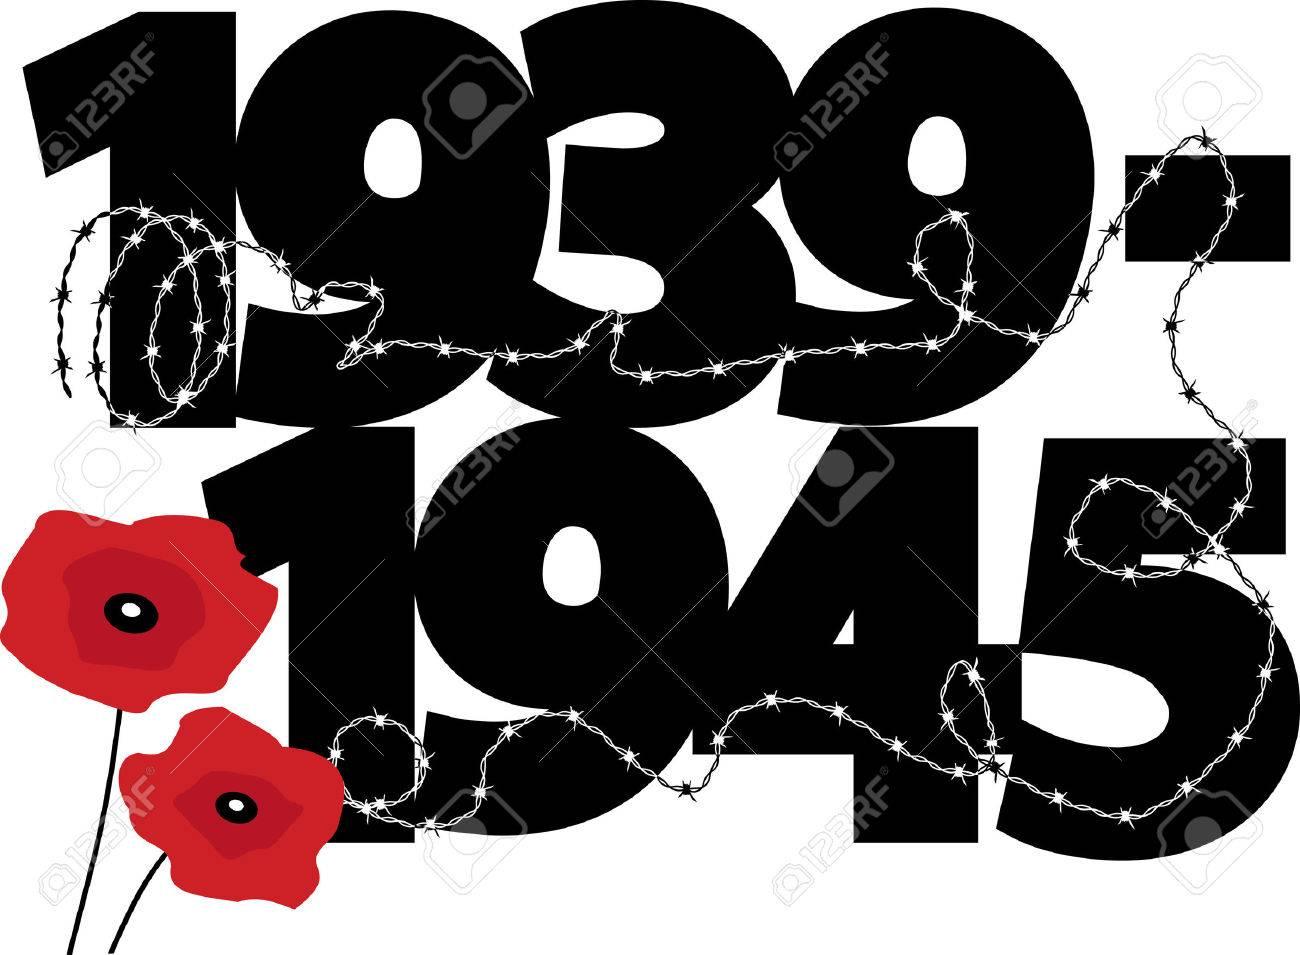 World War II commemorative symbol with calendar dates, poppies...